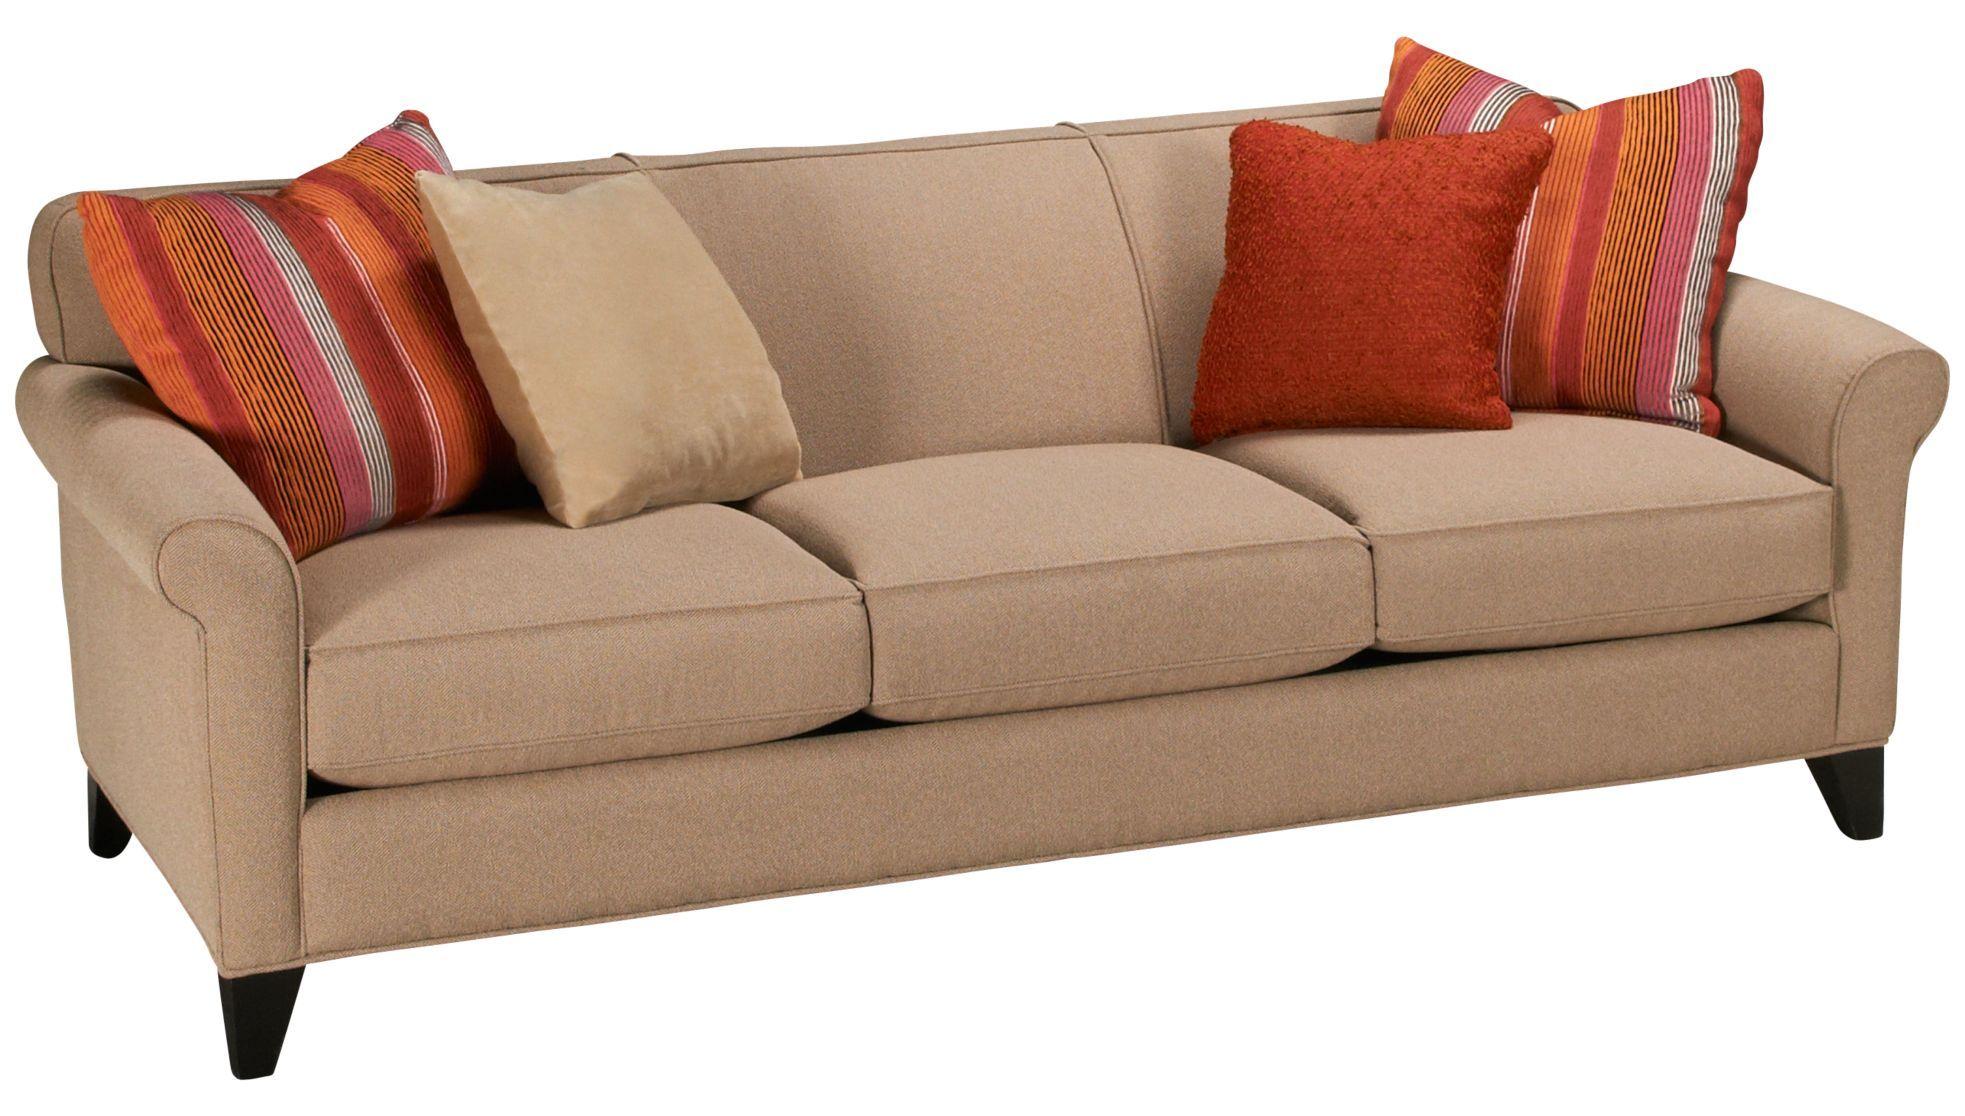 Jonathan Louis Selma Sofa   Sofas   Jordanu0027s Furniture $899